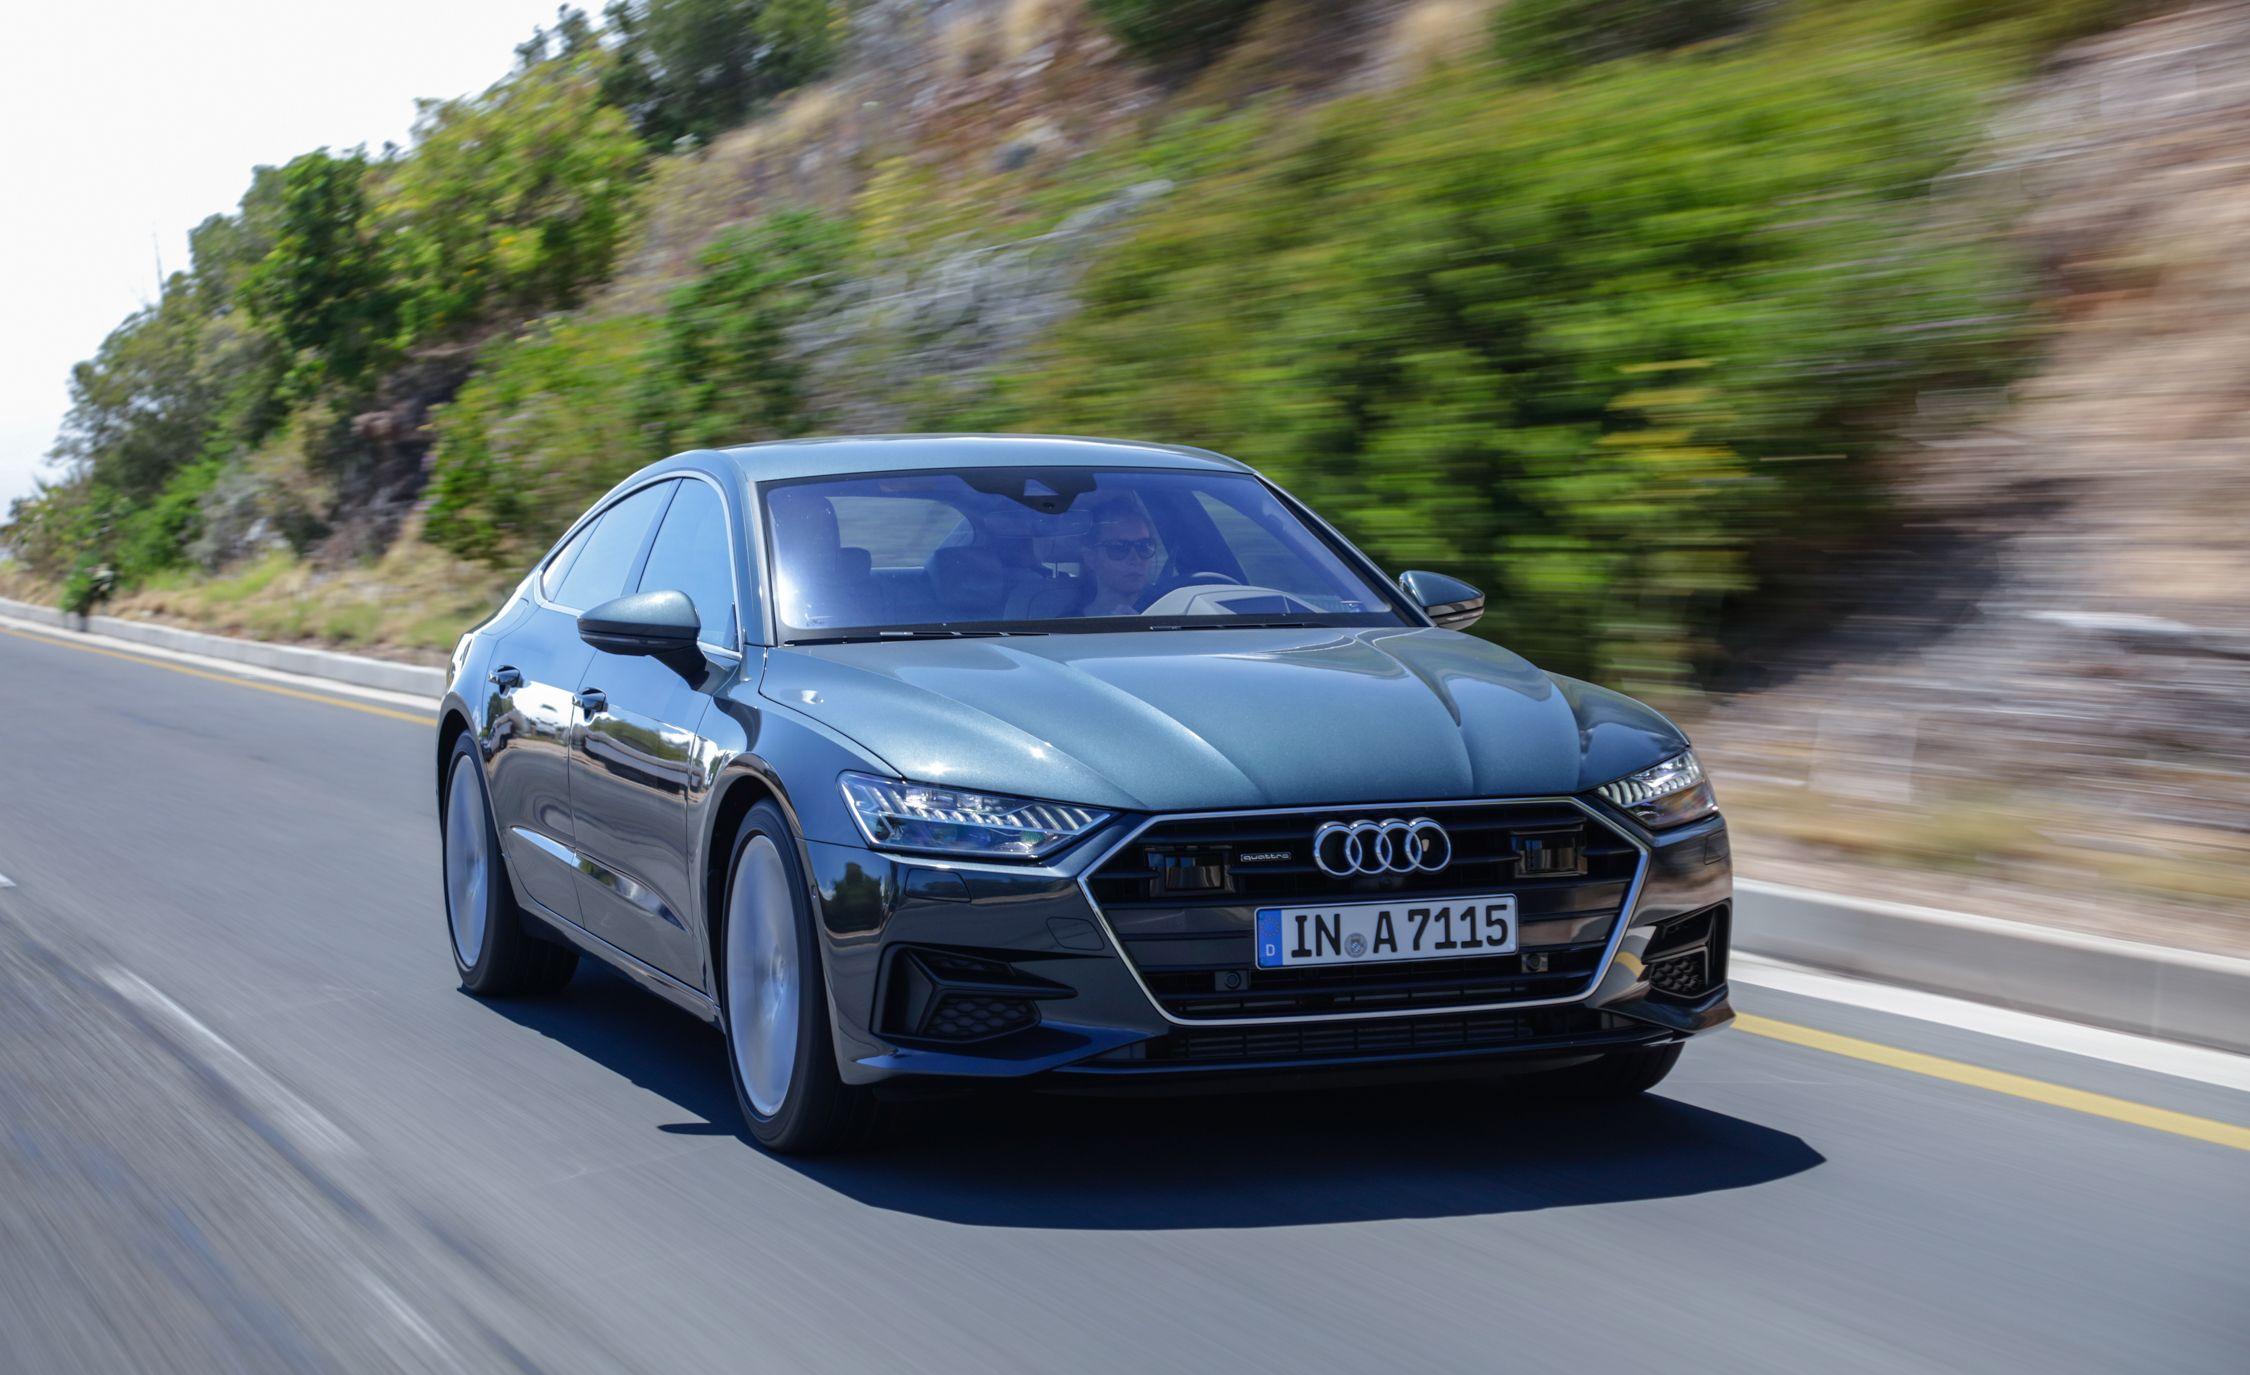 2019-Audi-A7-Sportback-161-1.jpg